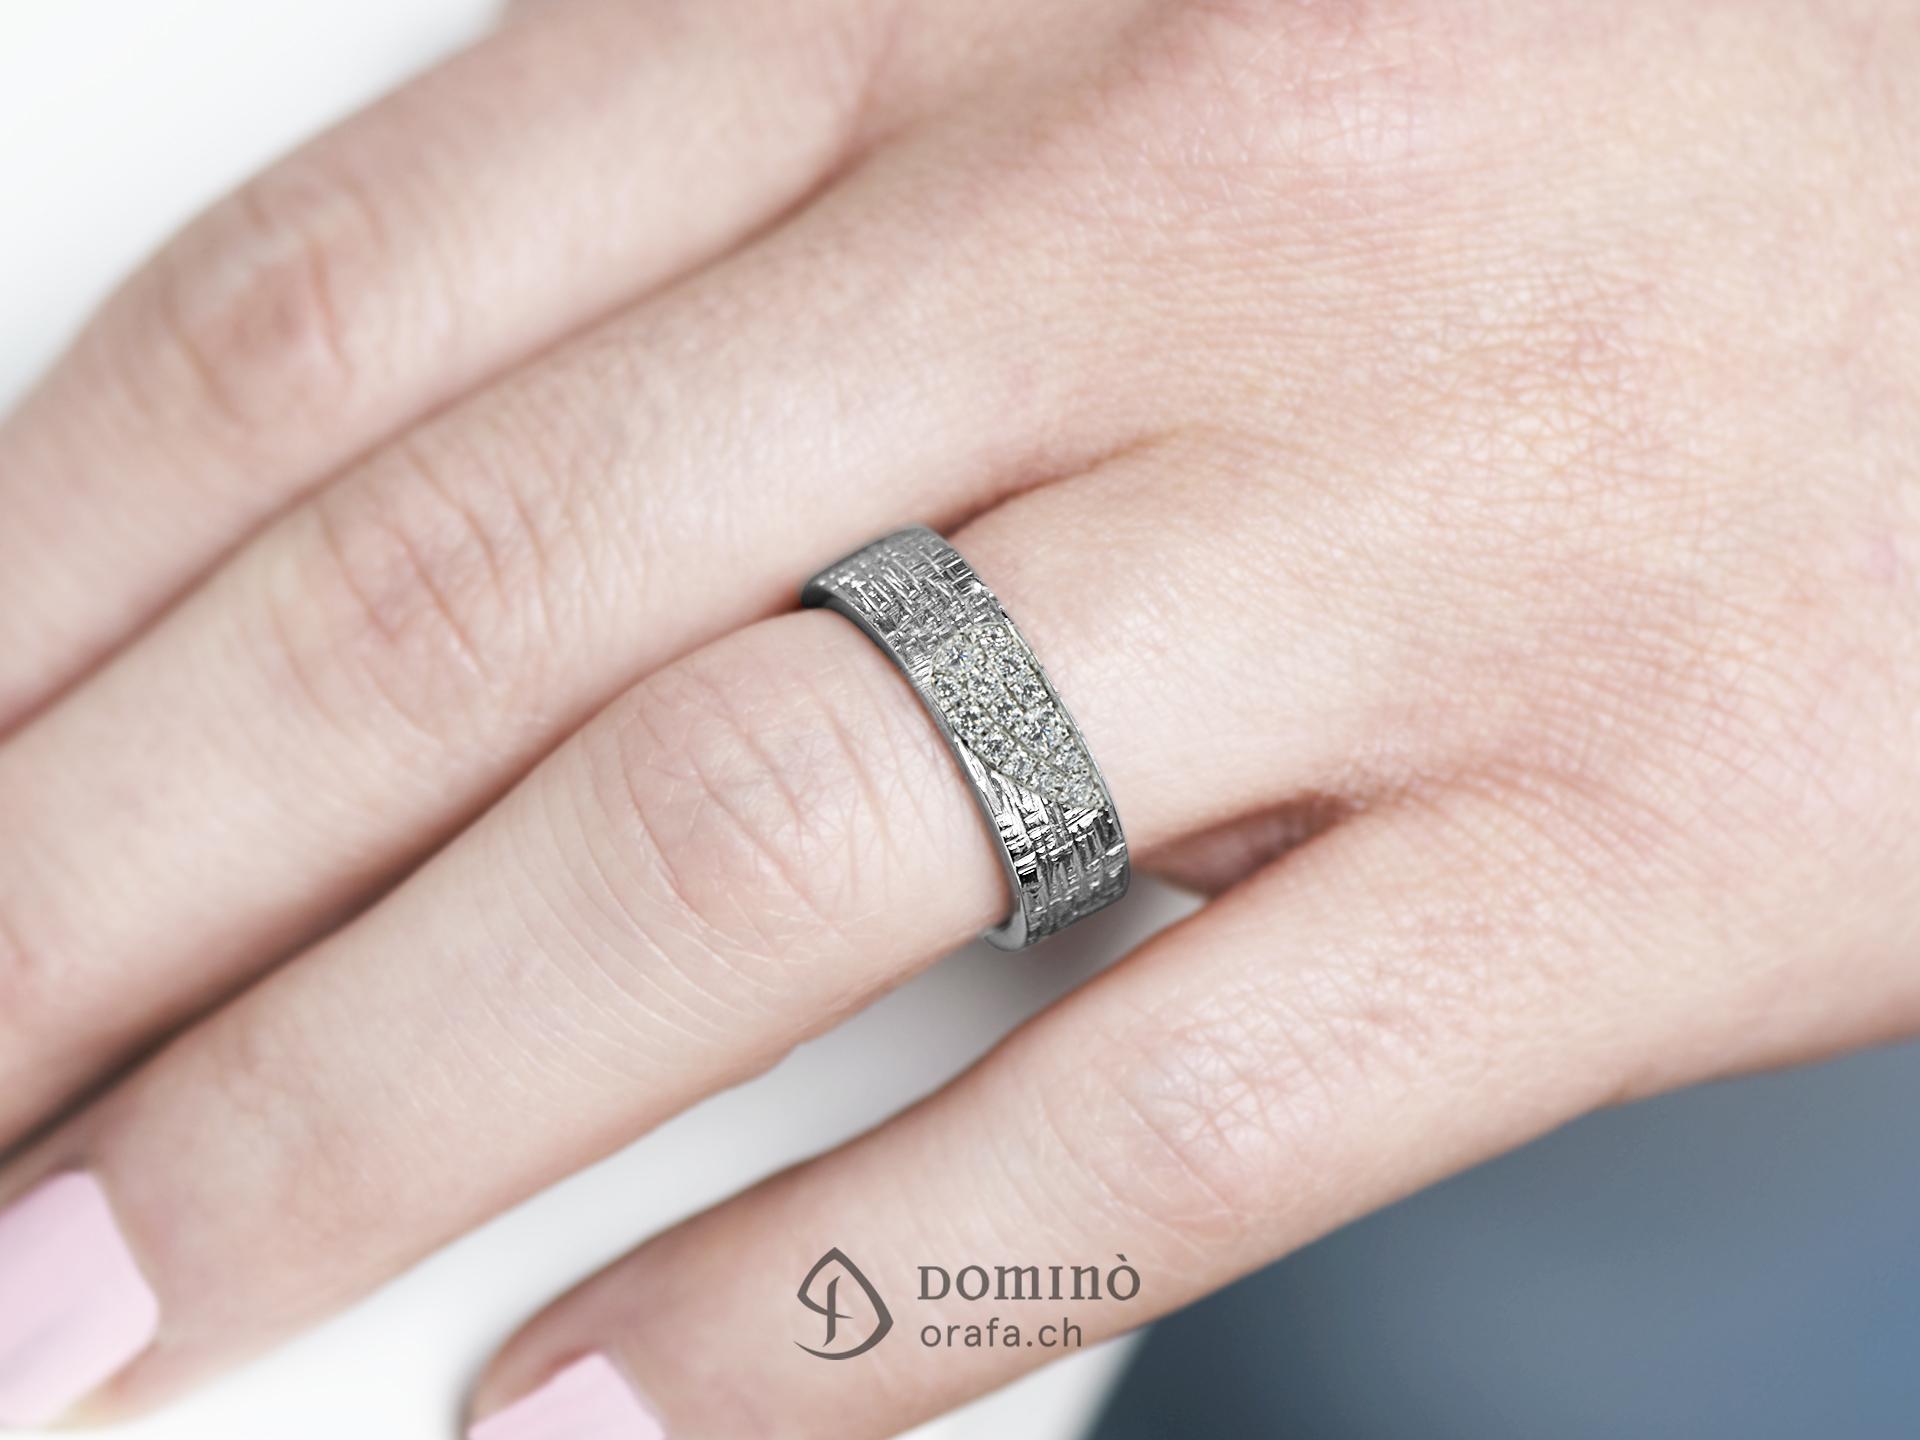 fedi-nuziali-linee-incrociate-cuore-diamanti-incolore-neri-2